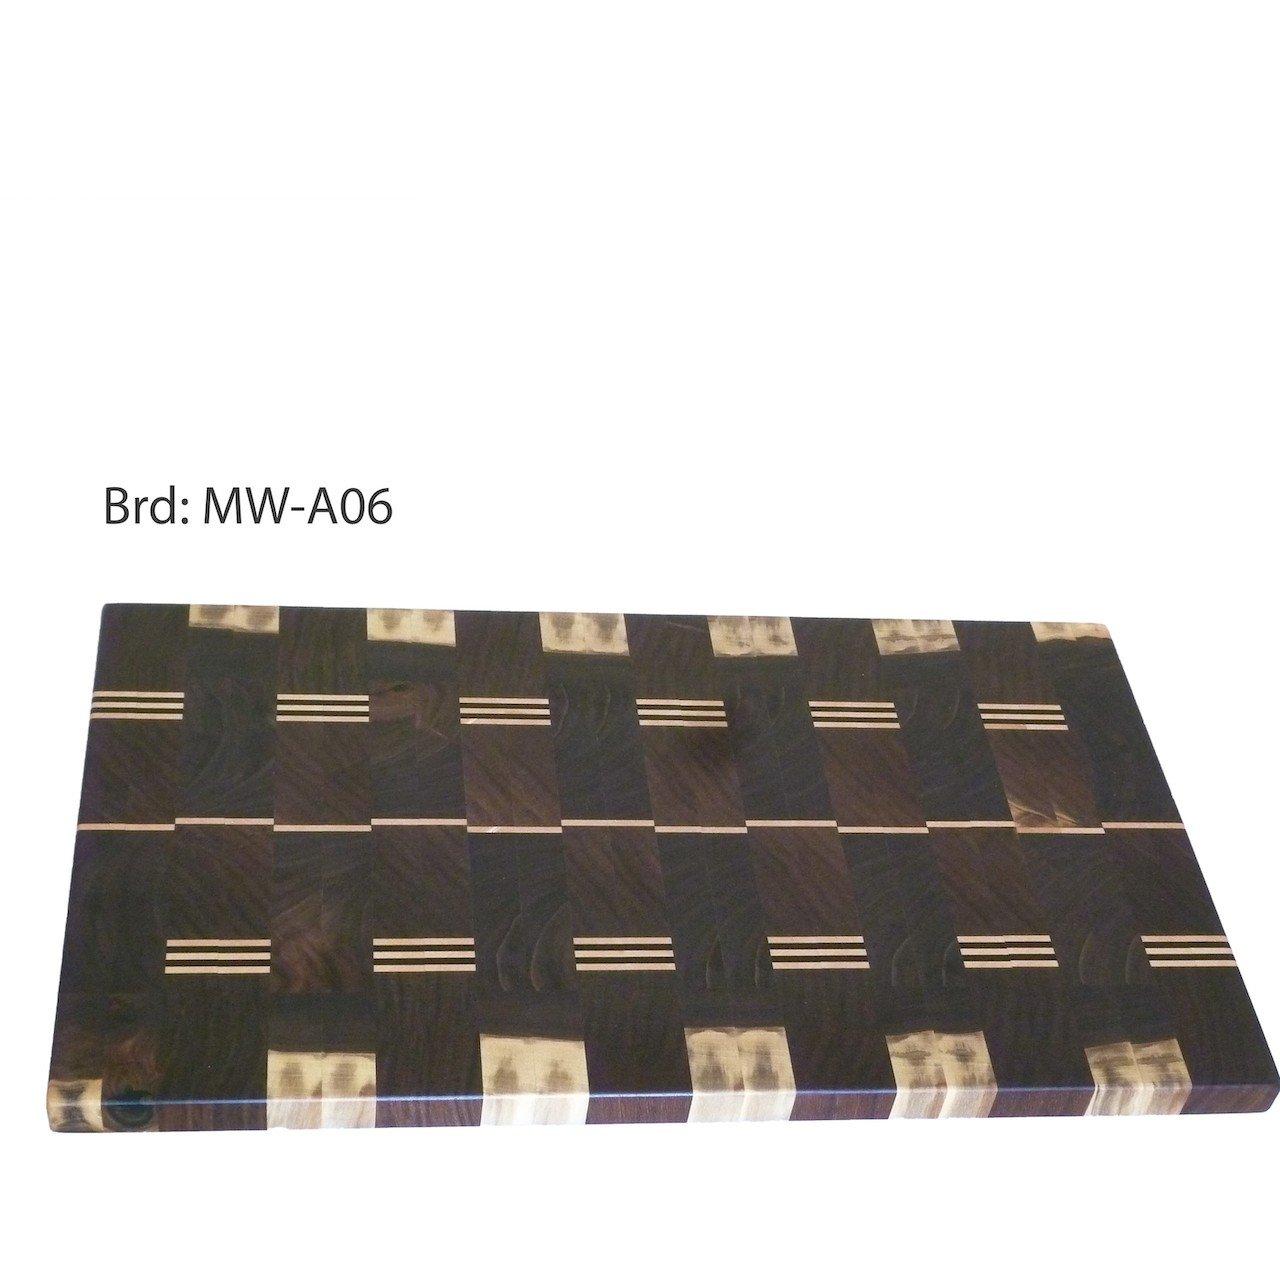 MW-A06